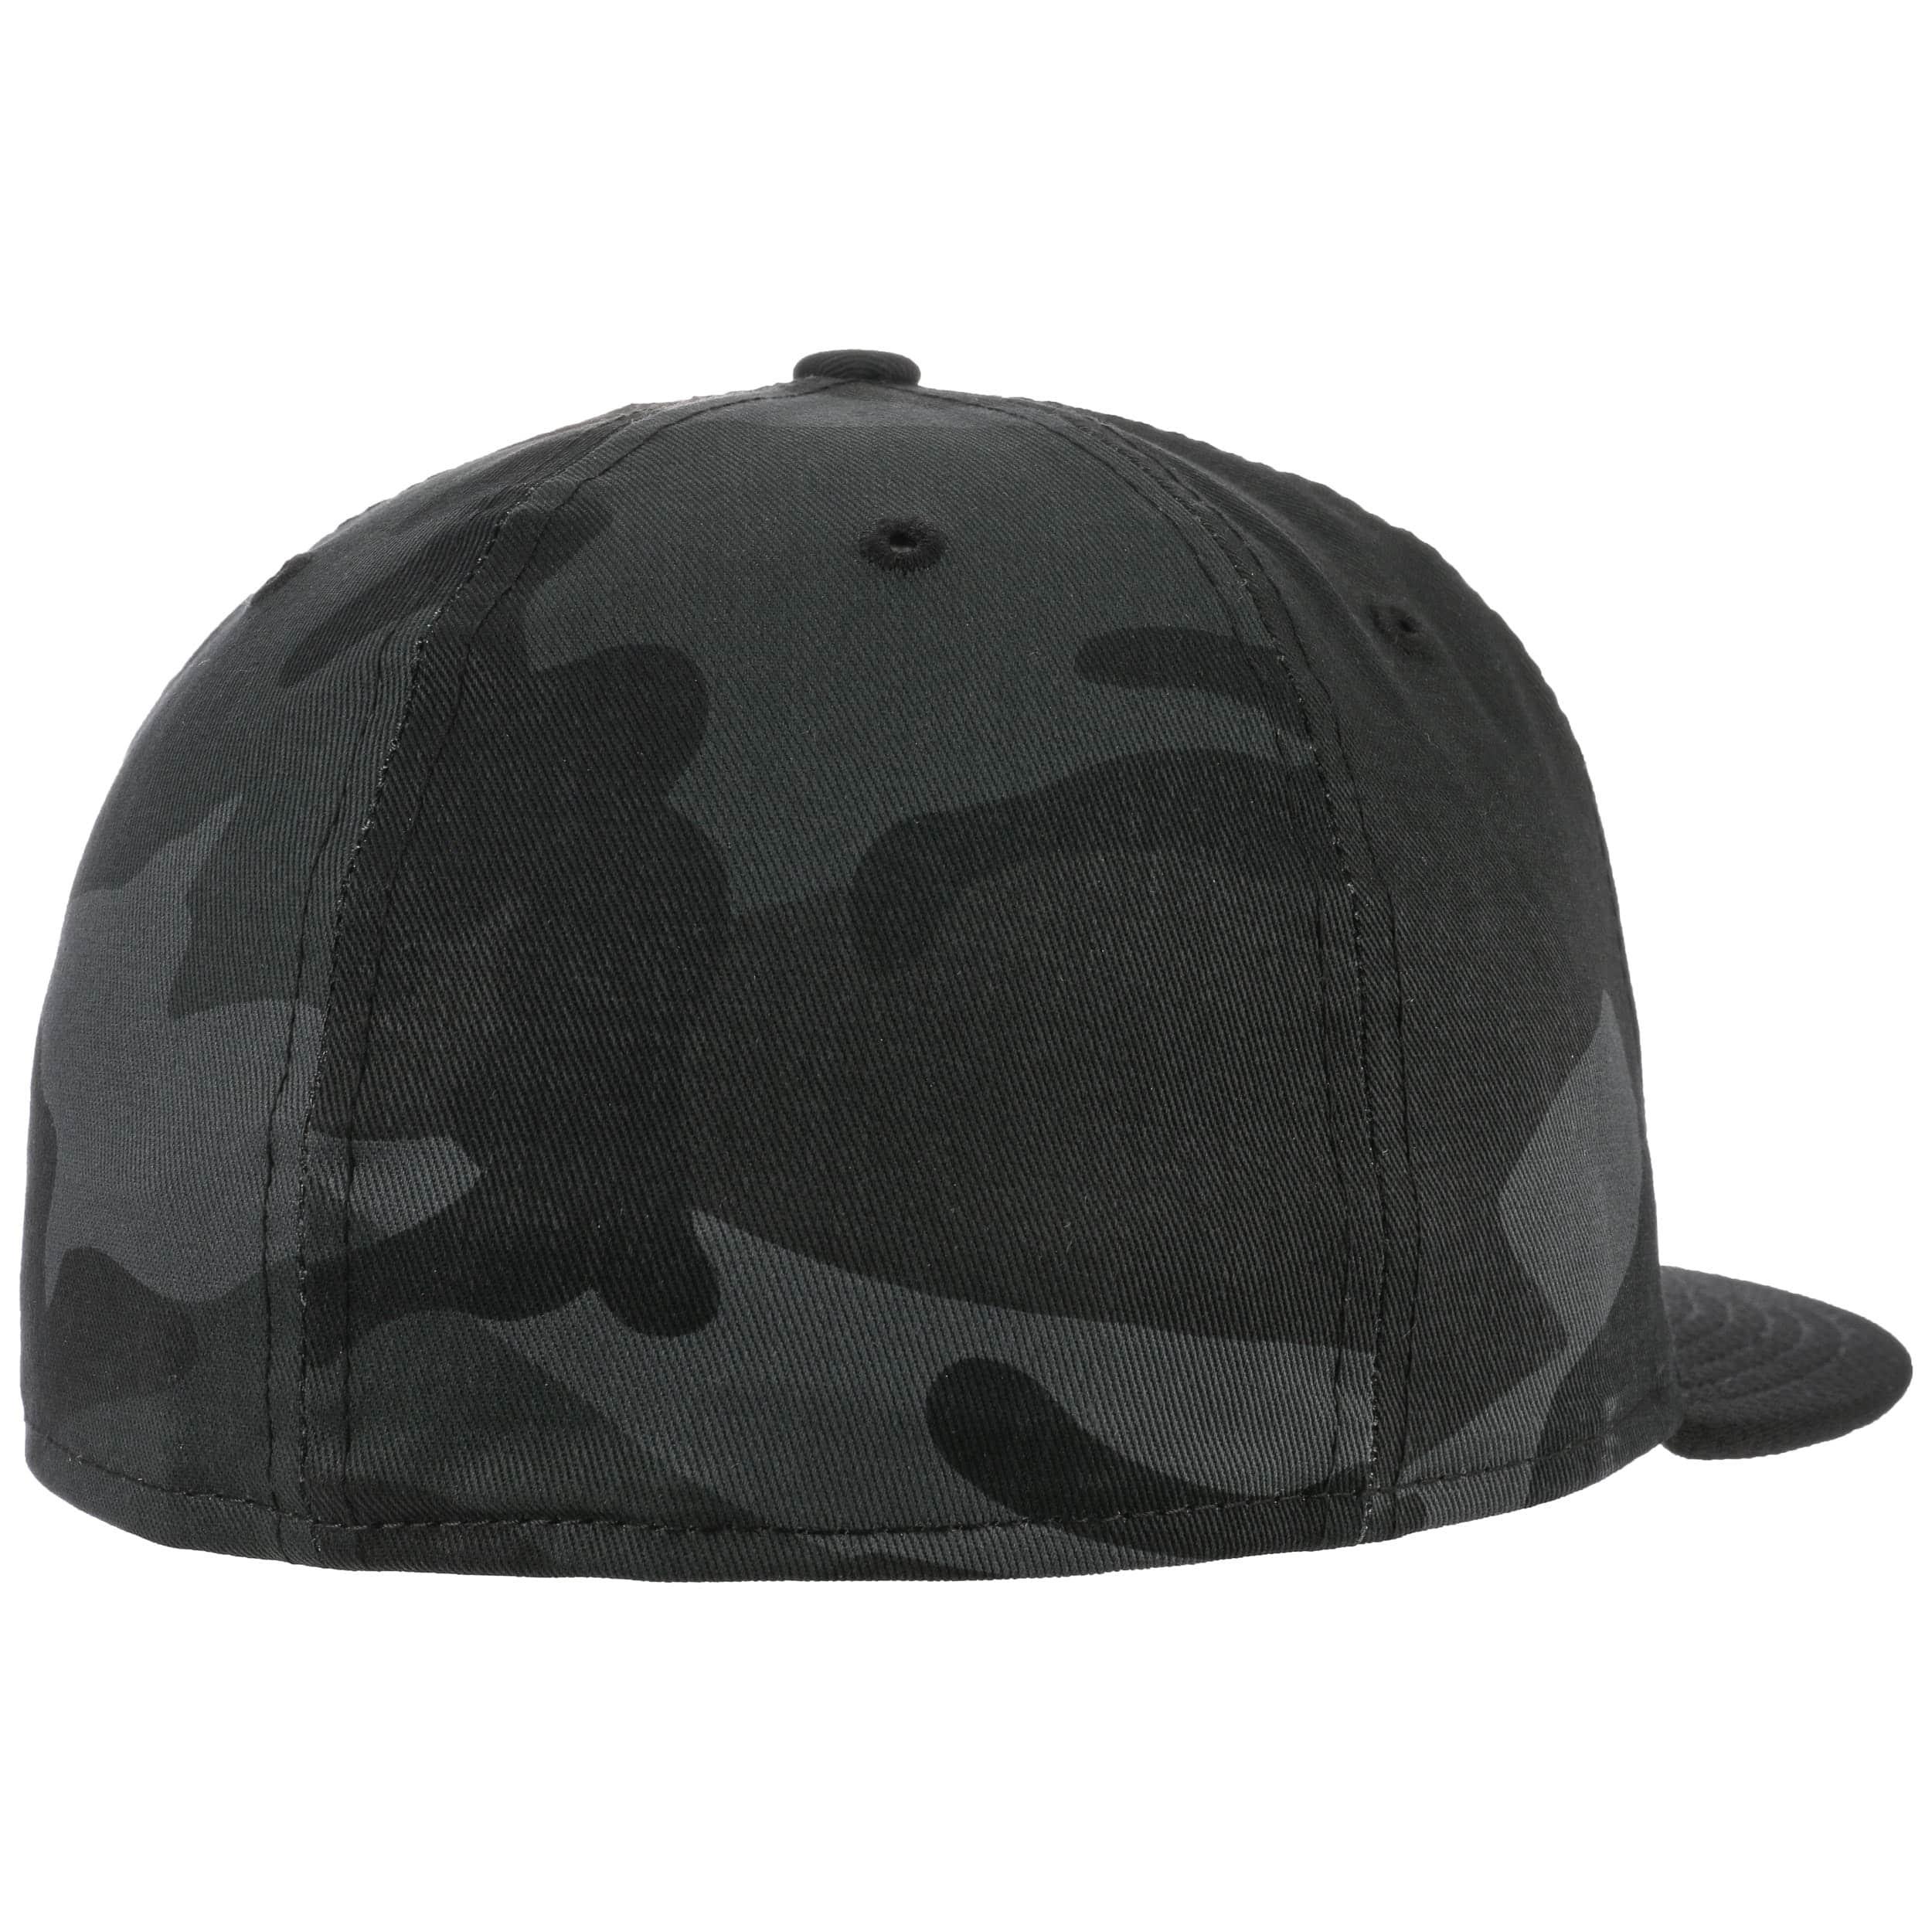 ... 59Fifty Camo Batman Fitted Cap by New Era - black 3 ... 8c9e57a6aac